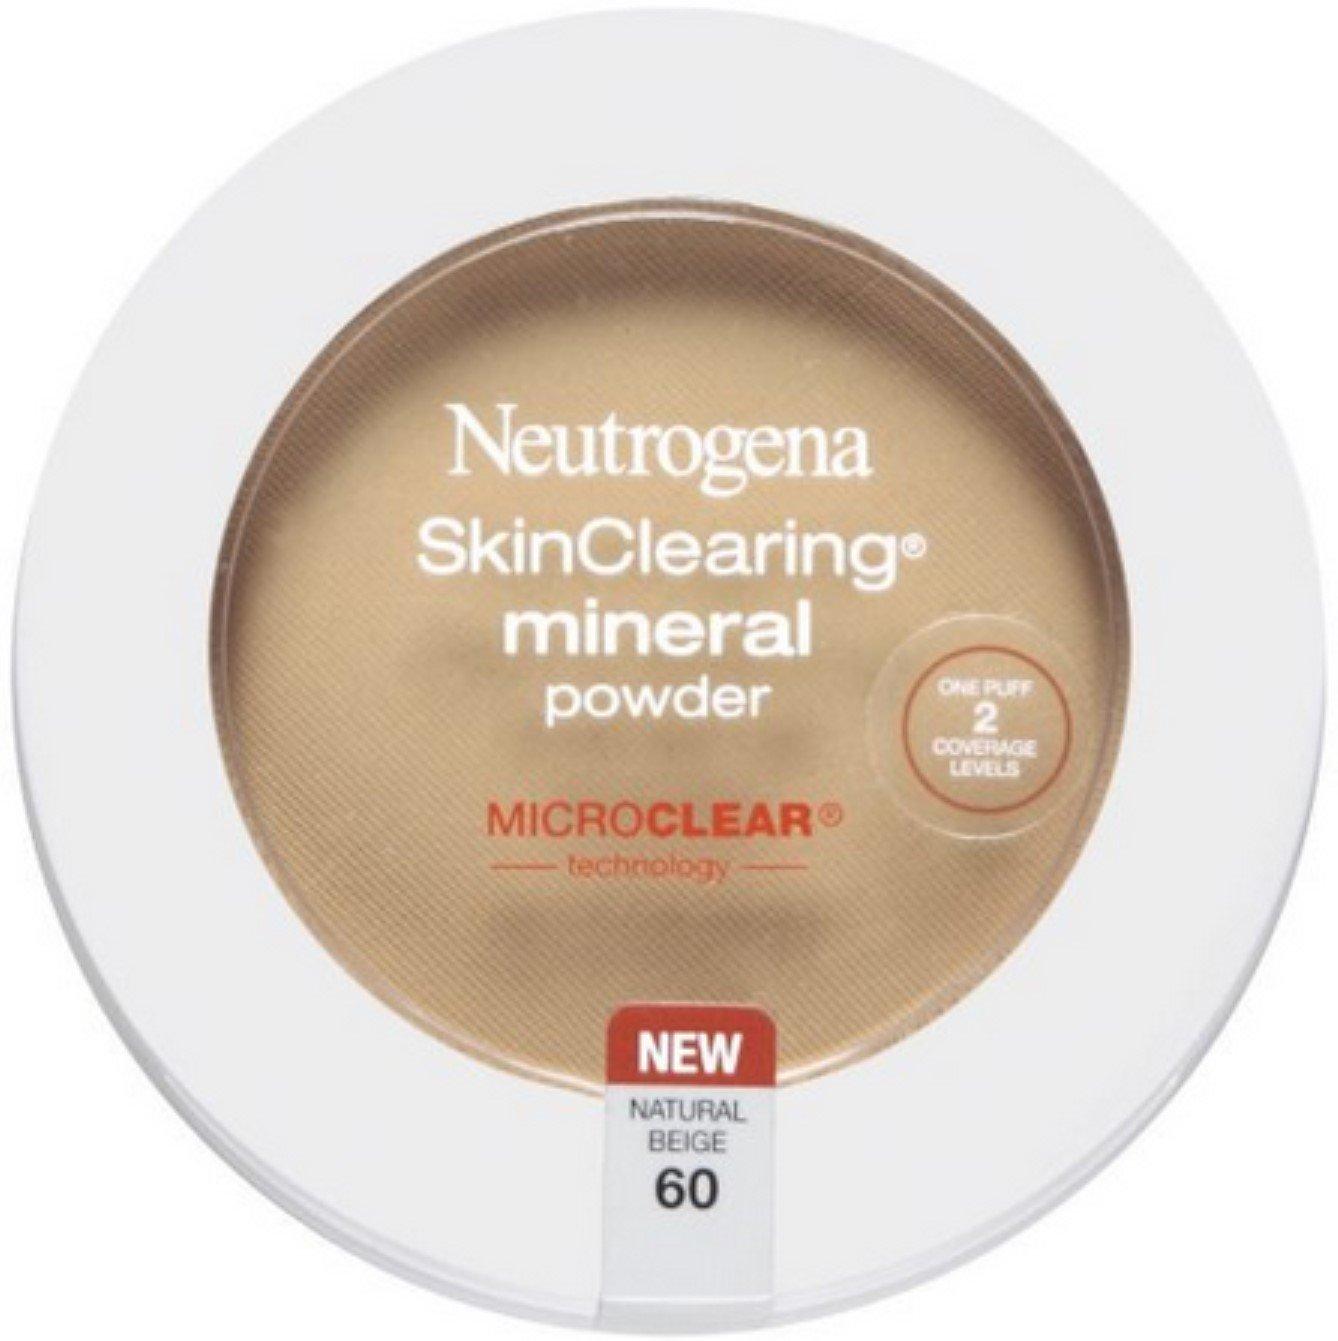 Neutrogena Skinclearing Mineral Powder, Natural Beige 60.38 Oz, (Pack of 2)